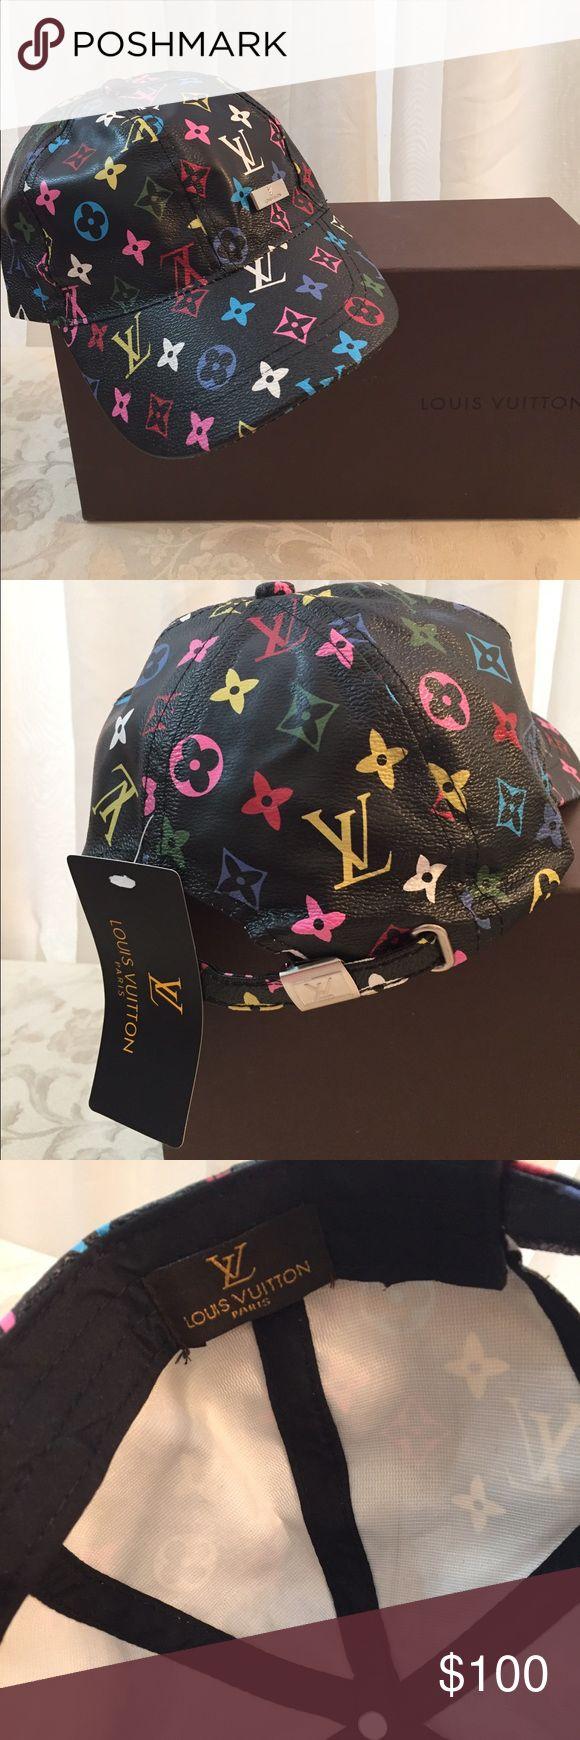 LV Sport Cap Unisex LV Multicolor Monogramed cap, unisex, New Louis Vuitton Accessories Hats